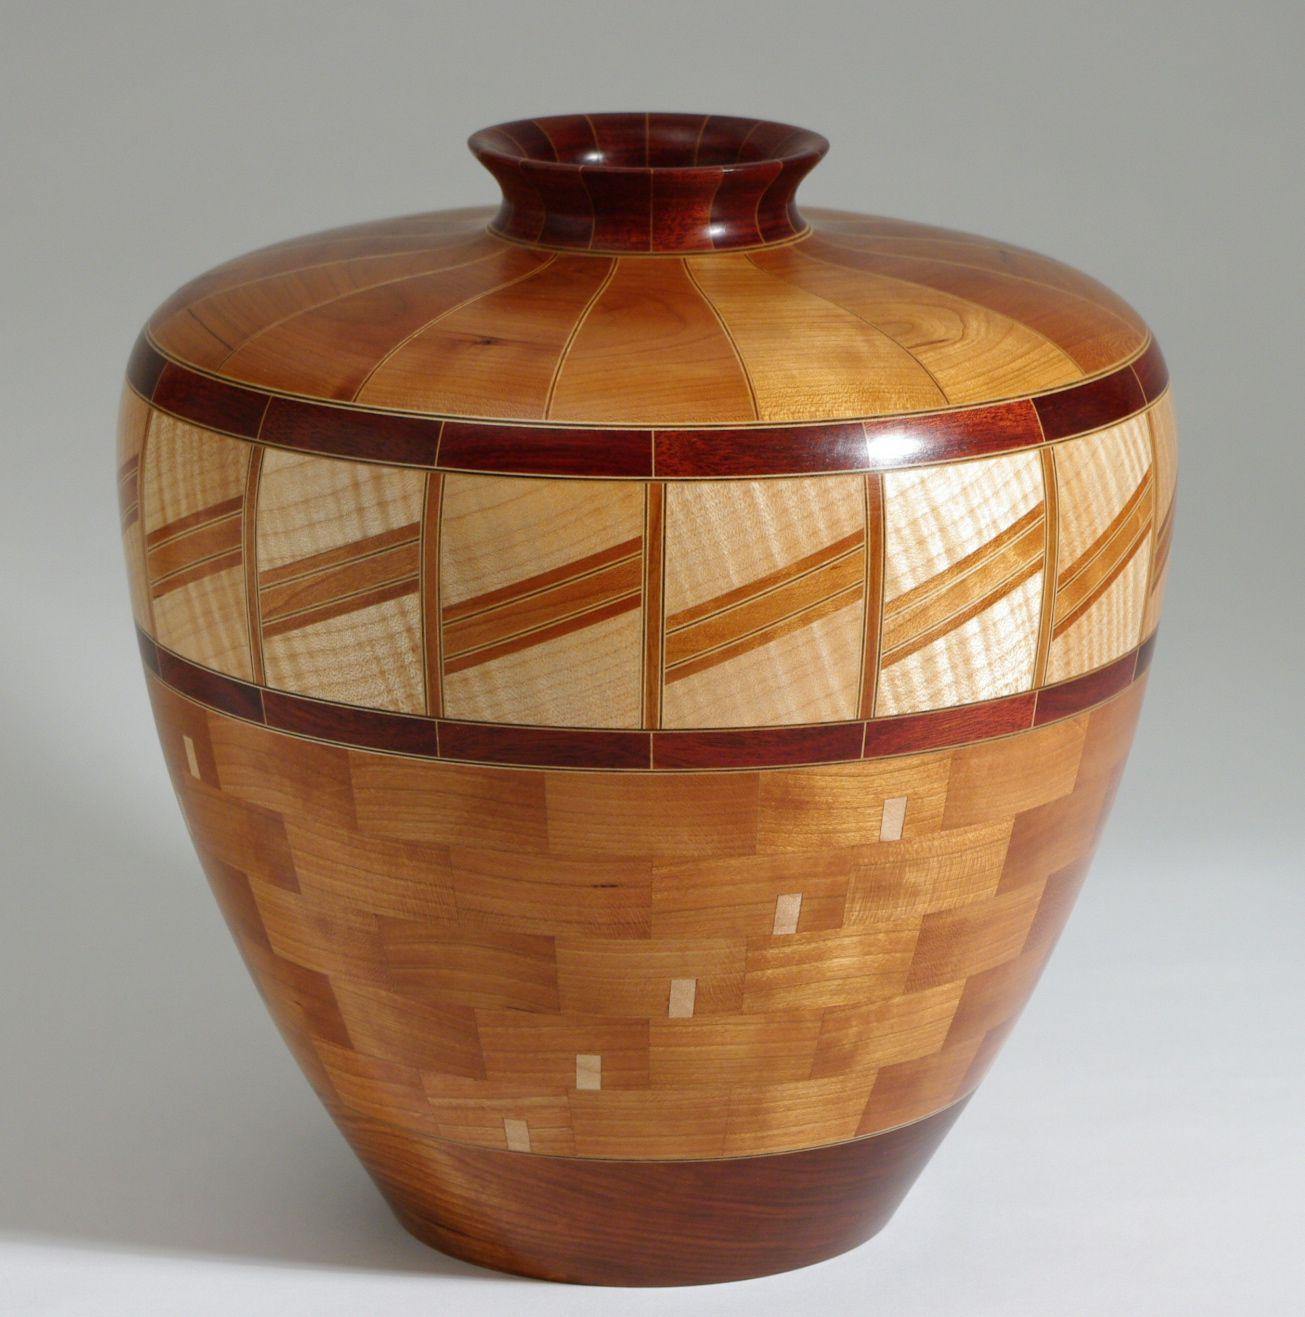 Amazing segmented vase. Woodturning Art by Mark Murakami